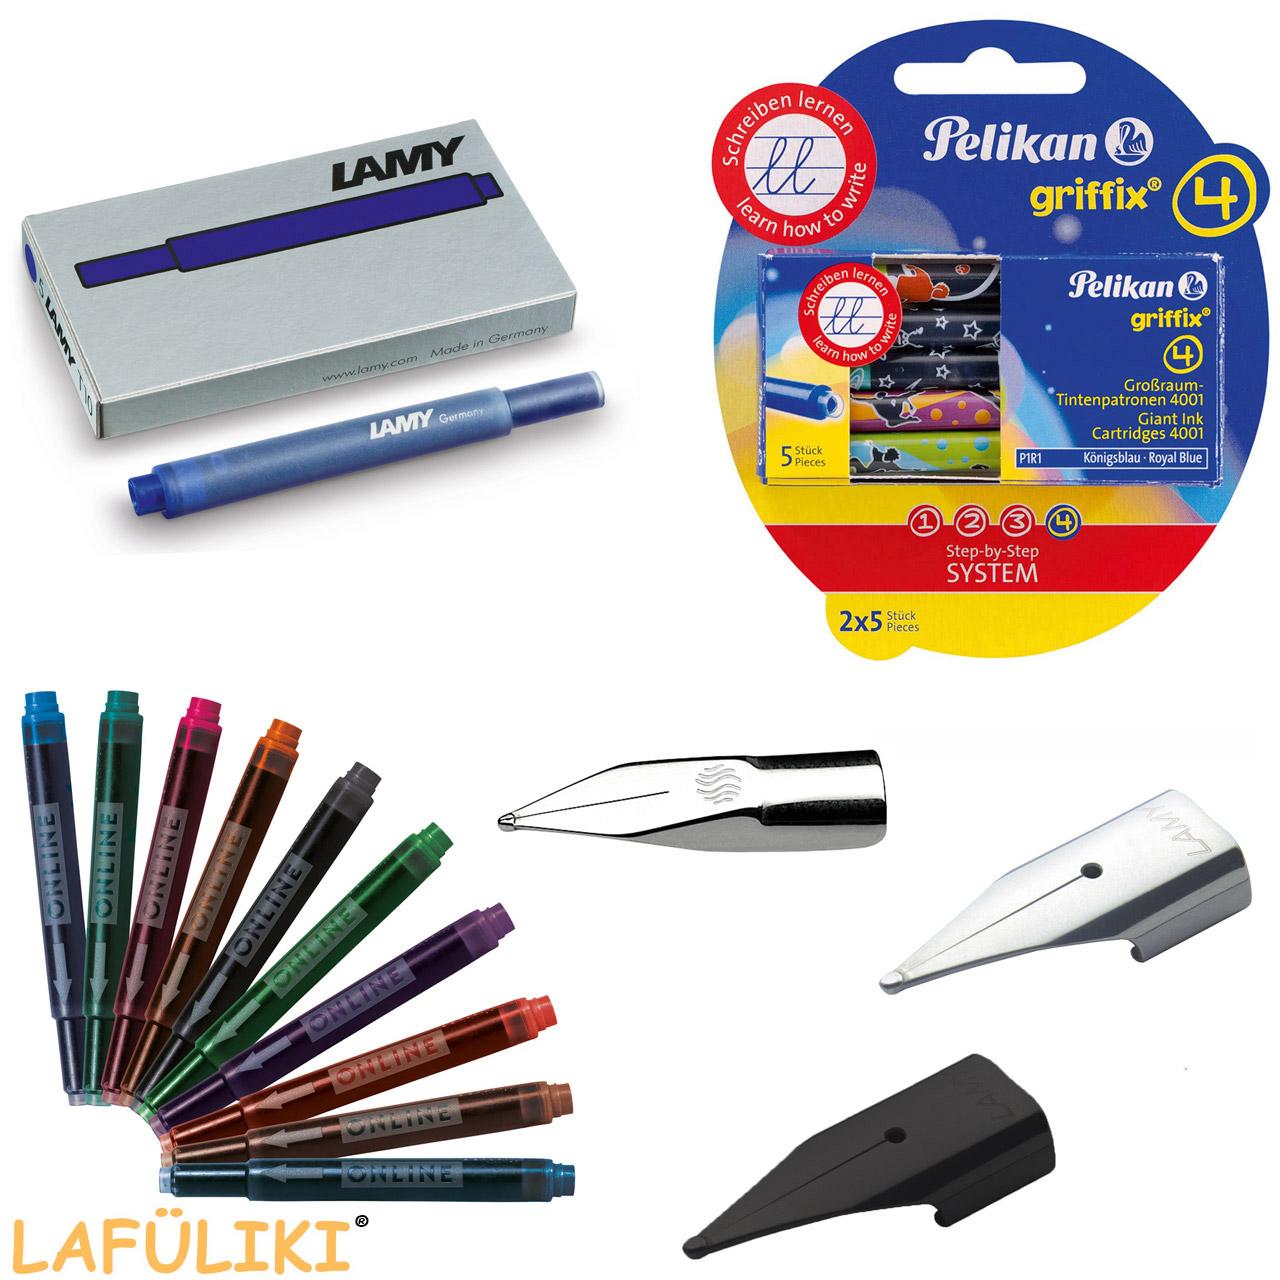 PILOT HI-TEC-C COLETO 4-COLOR GEL INK PEN 0.5mm CDP 1 /& 4 refills ~sale